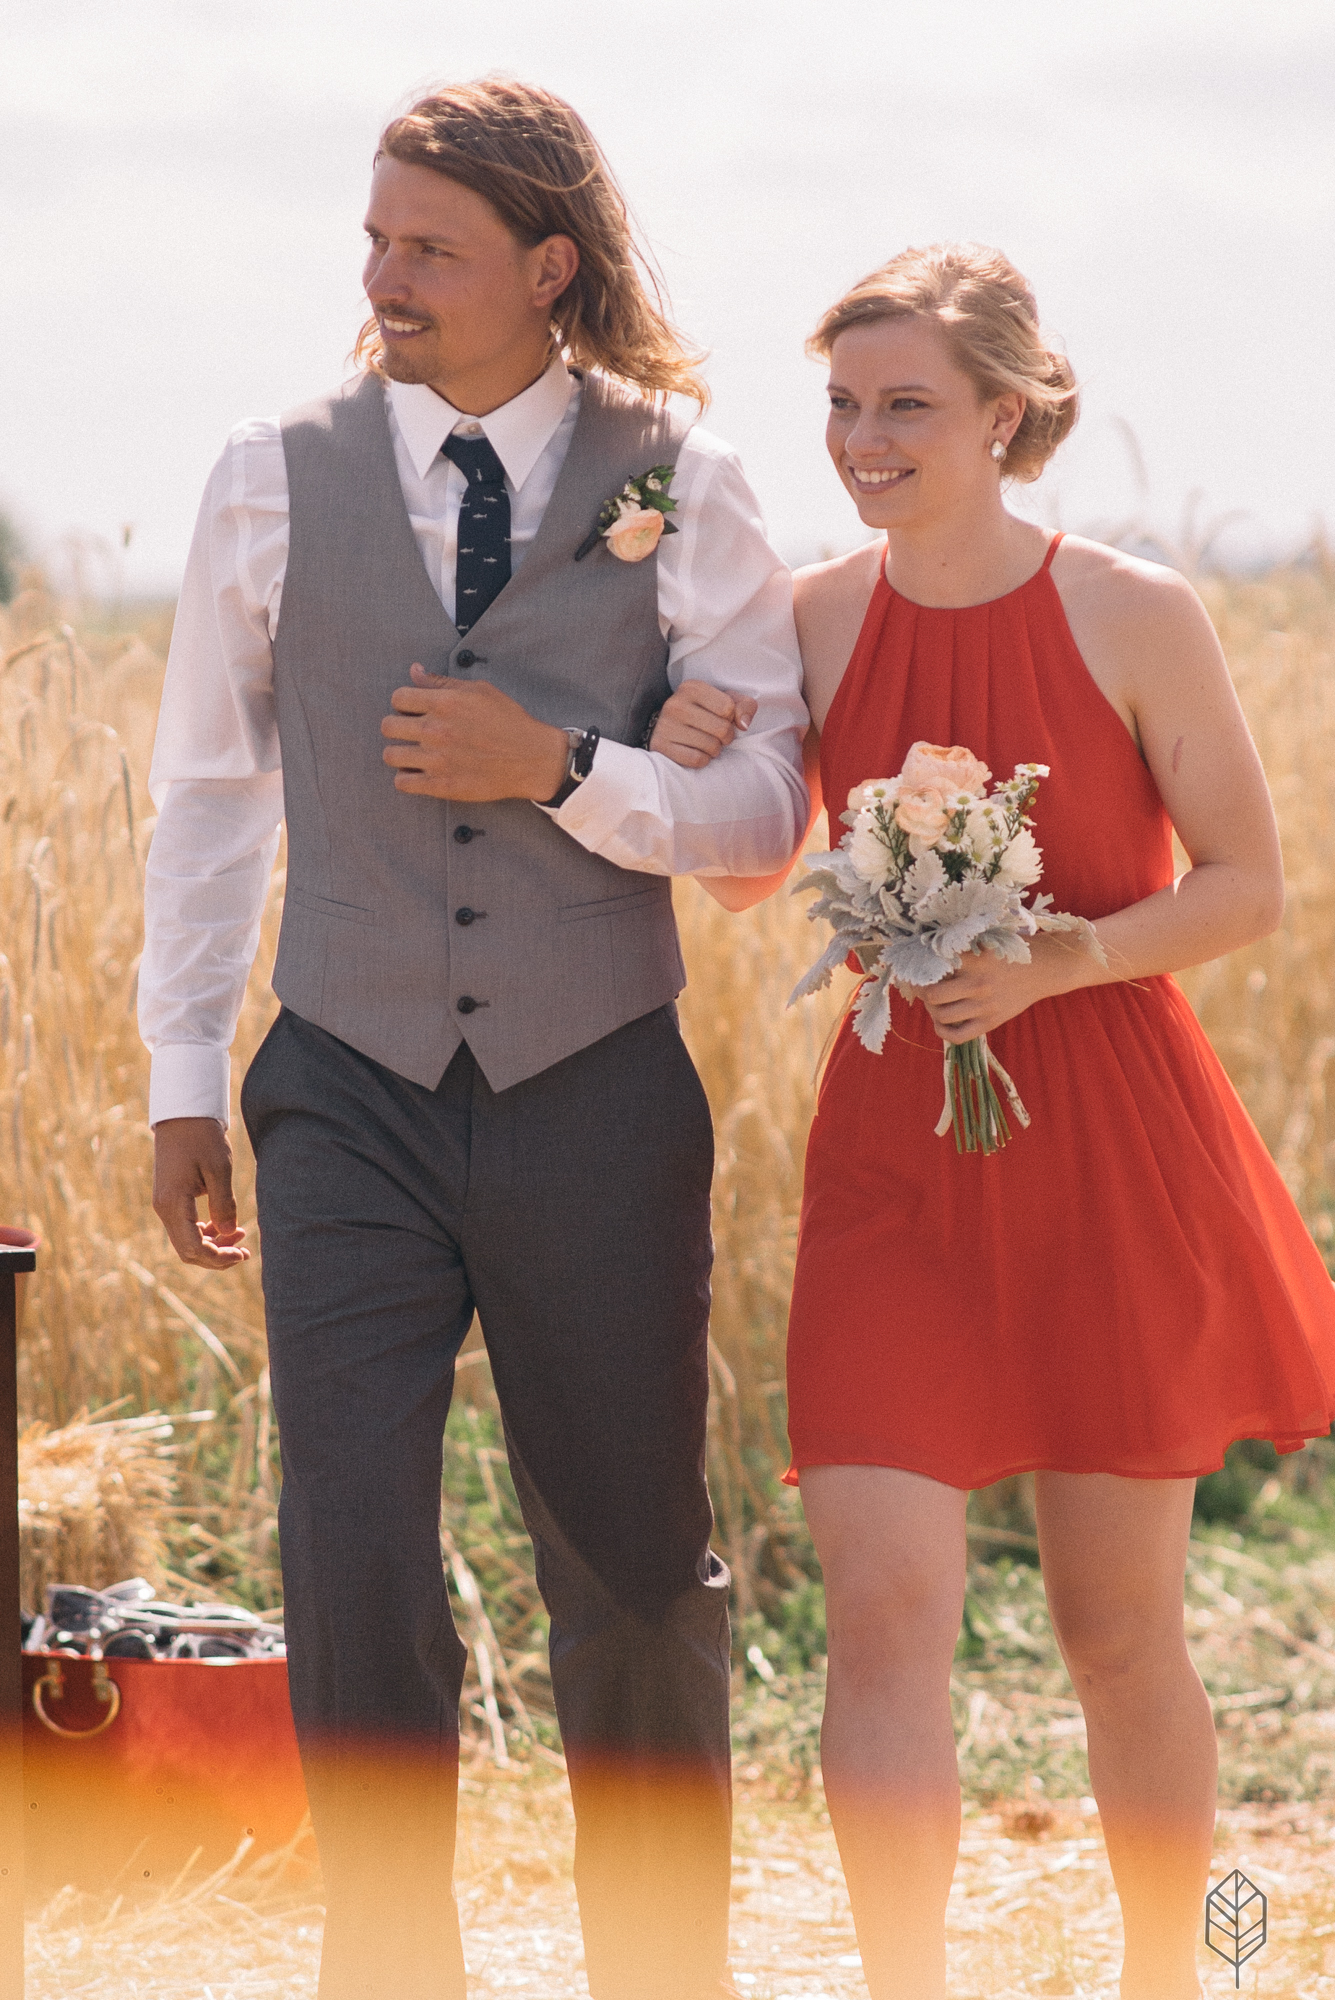 johnsonscreative_Ambrosia_wedding-33.jpg